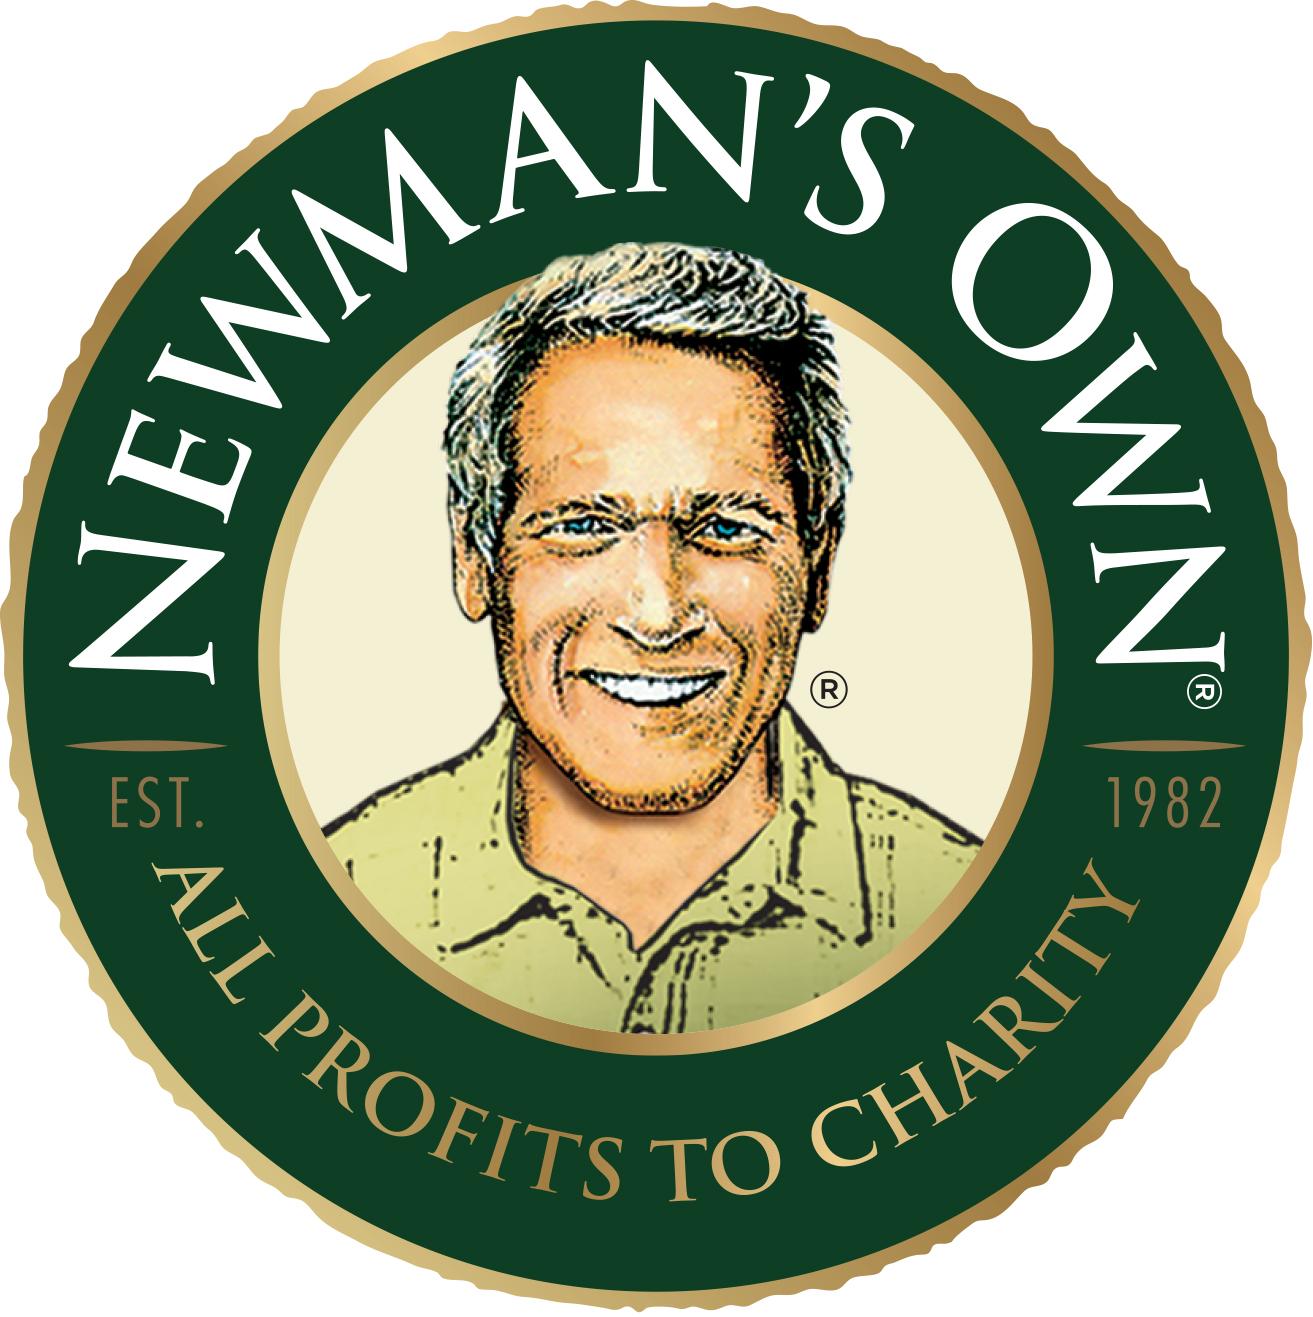 Newmans-Own-Foundation-logo.jpg